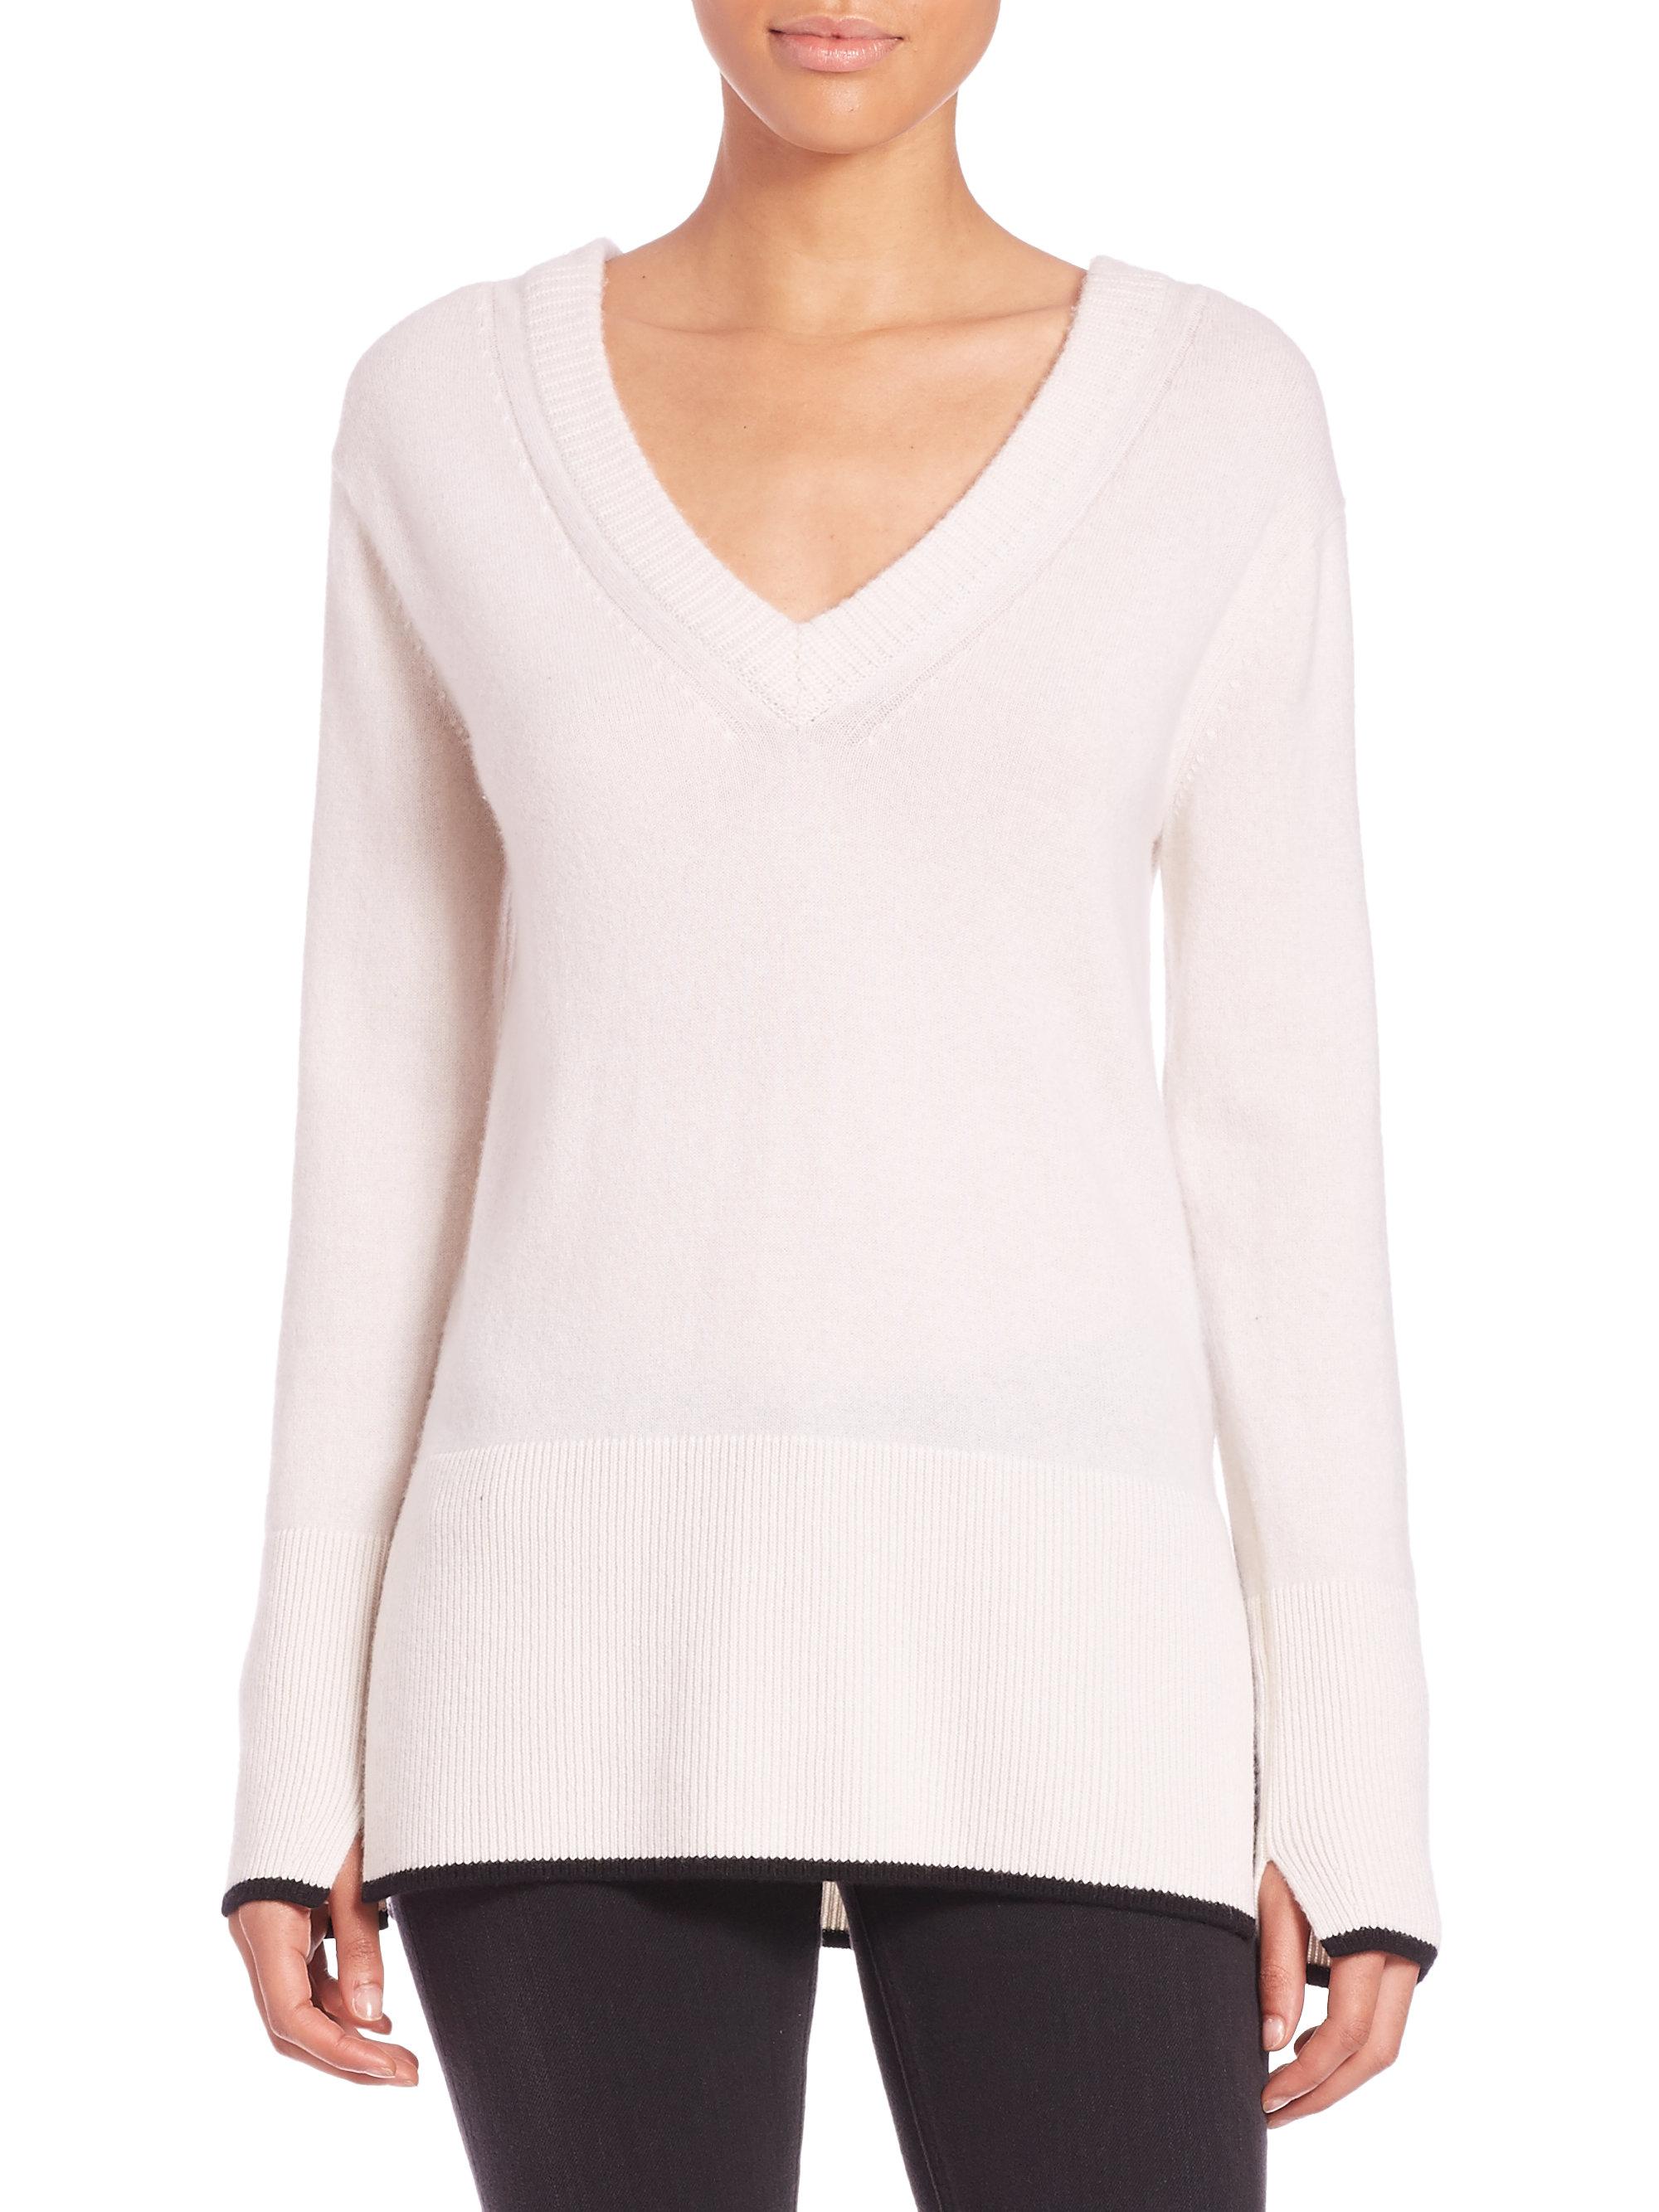 Clearance Buy Rag & Bone cashmere V-neck jumper Excellent Discount 100% Authentic wxcw1HVp